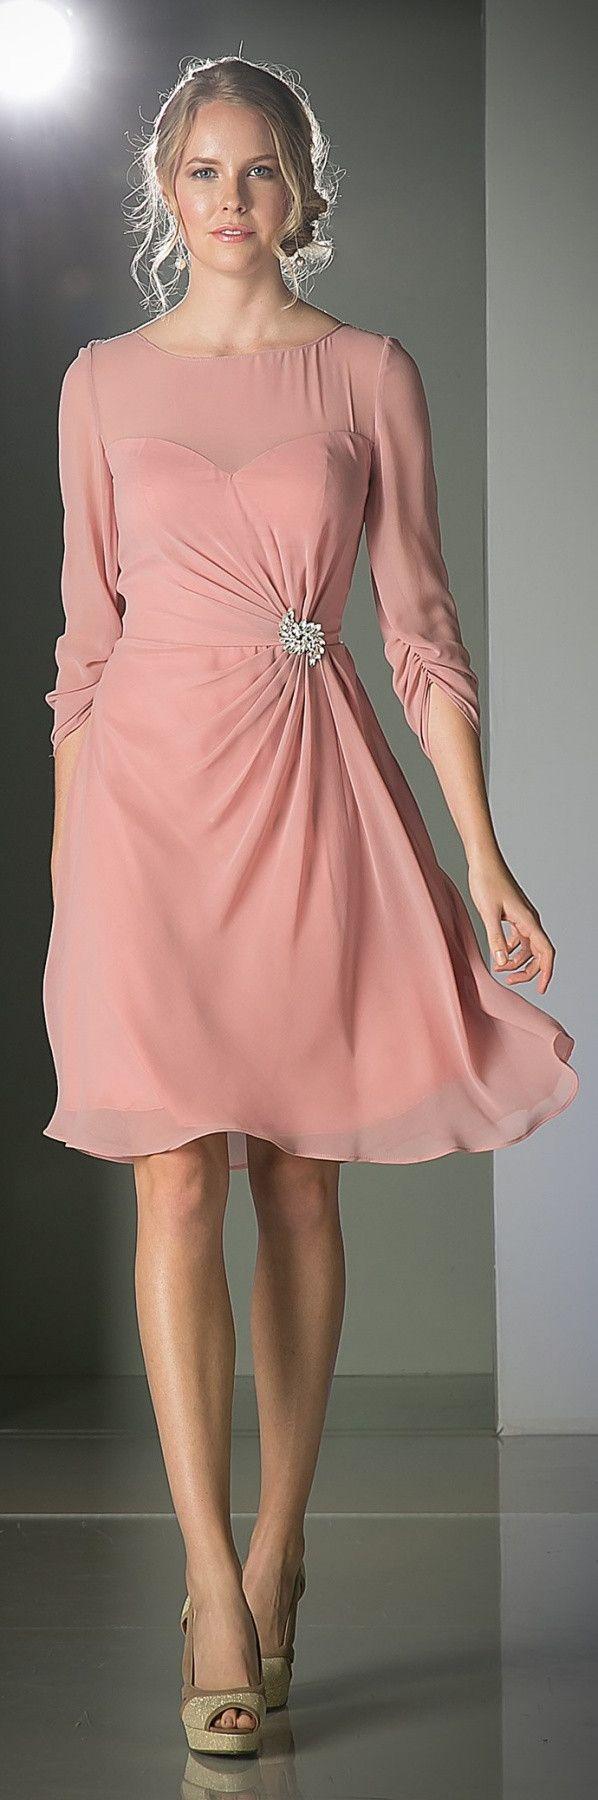 Scoop Neckline 3/4 Sleeves Cocktail Dress Rose Knee Length ...